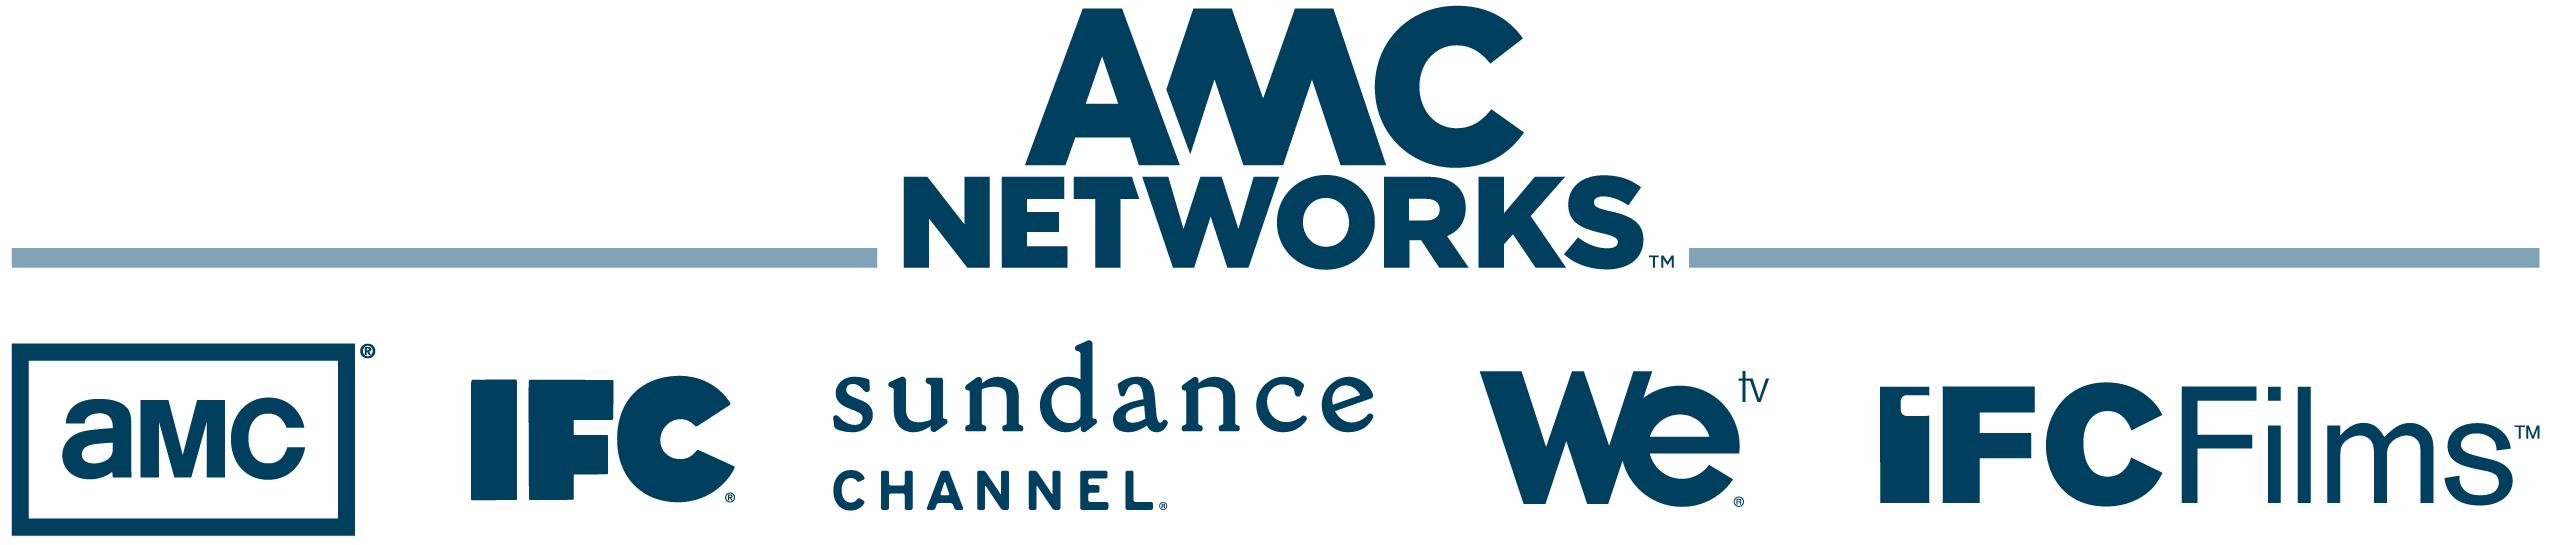 amc networks logo png wwwpixsharkcom images